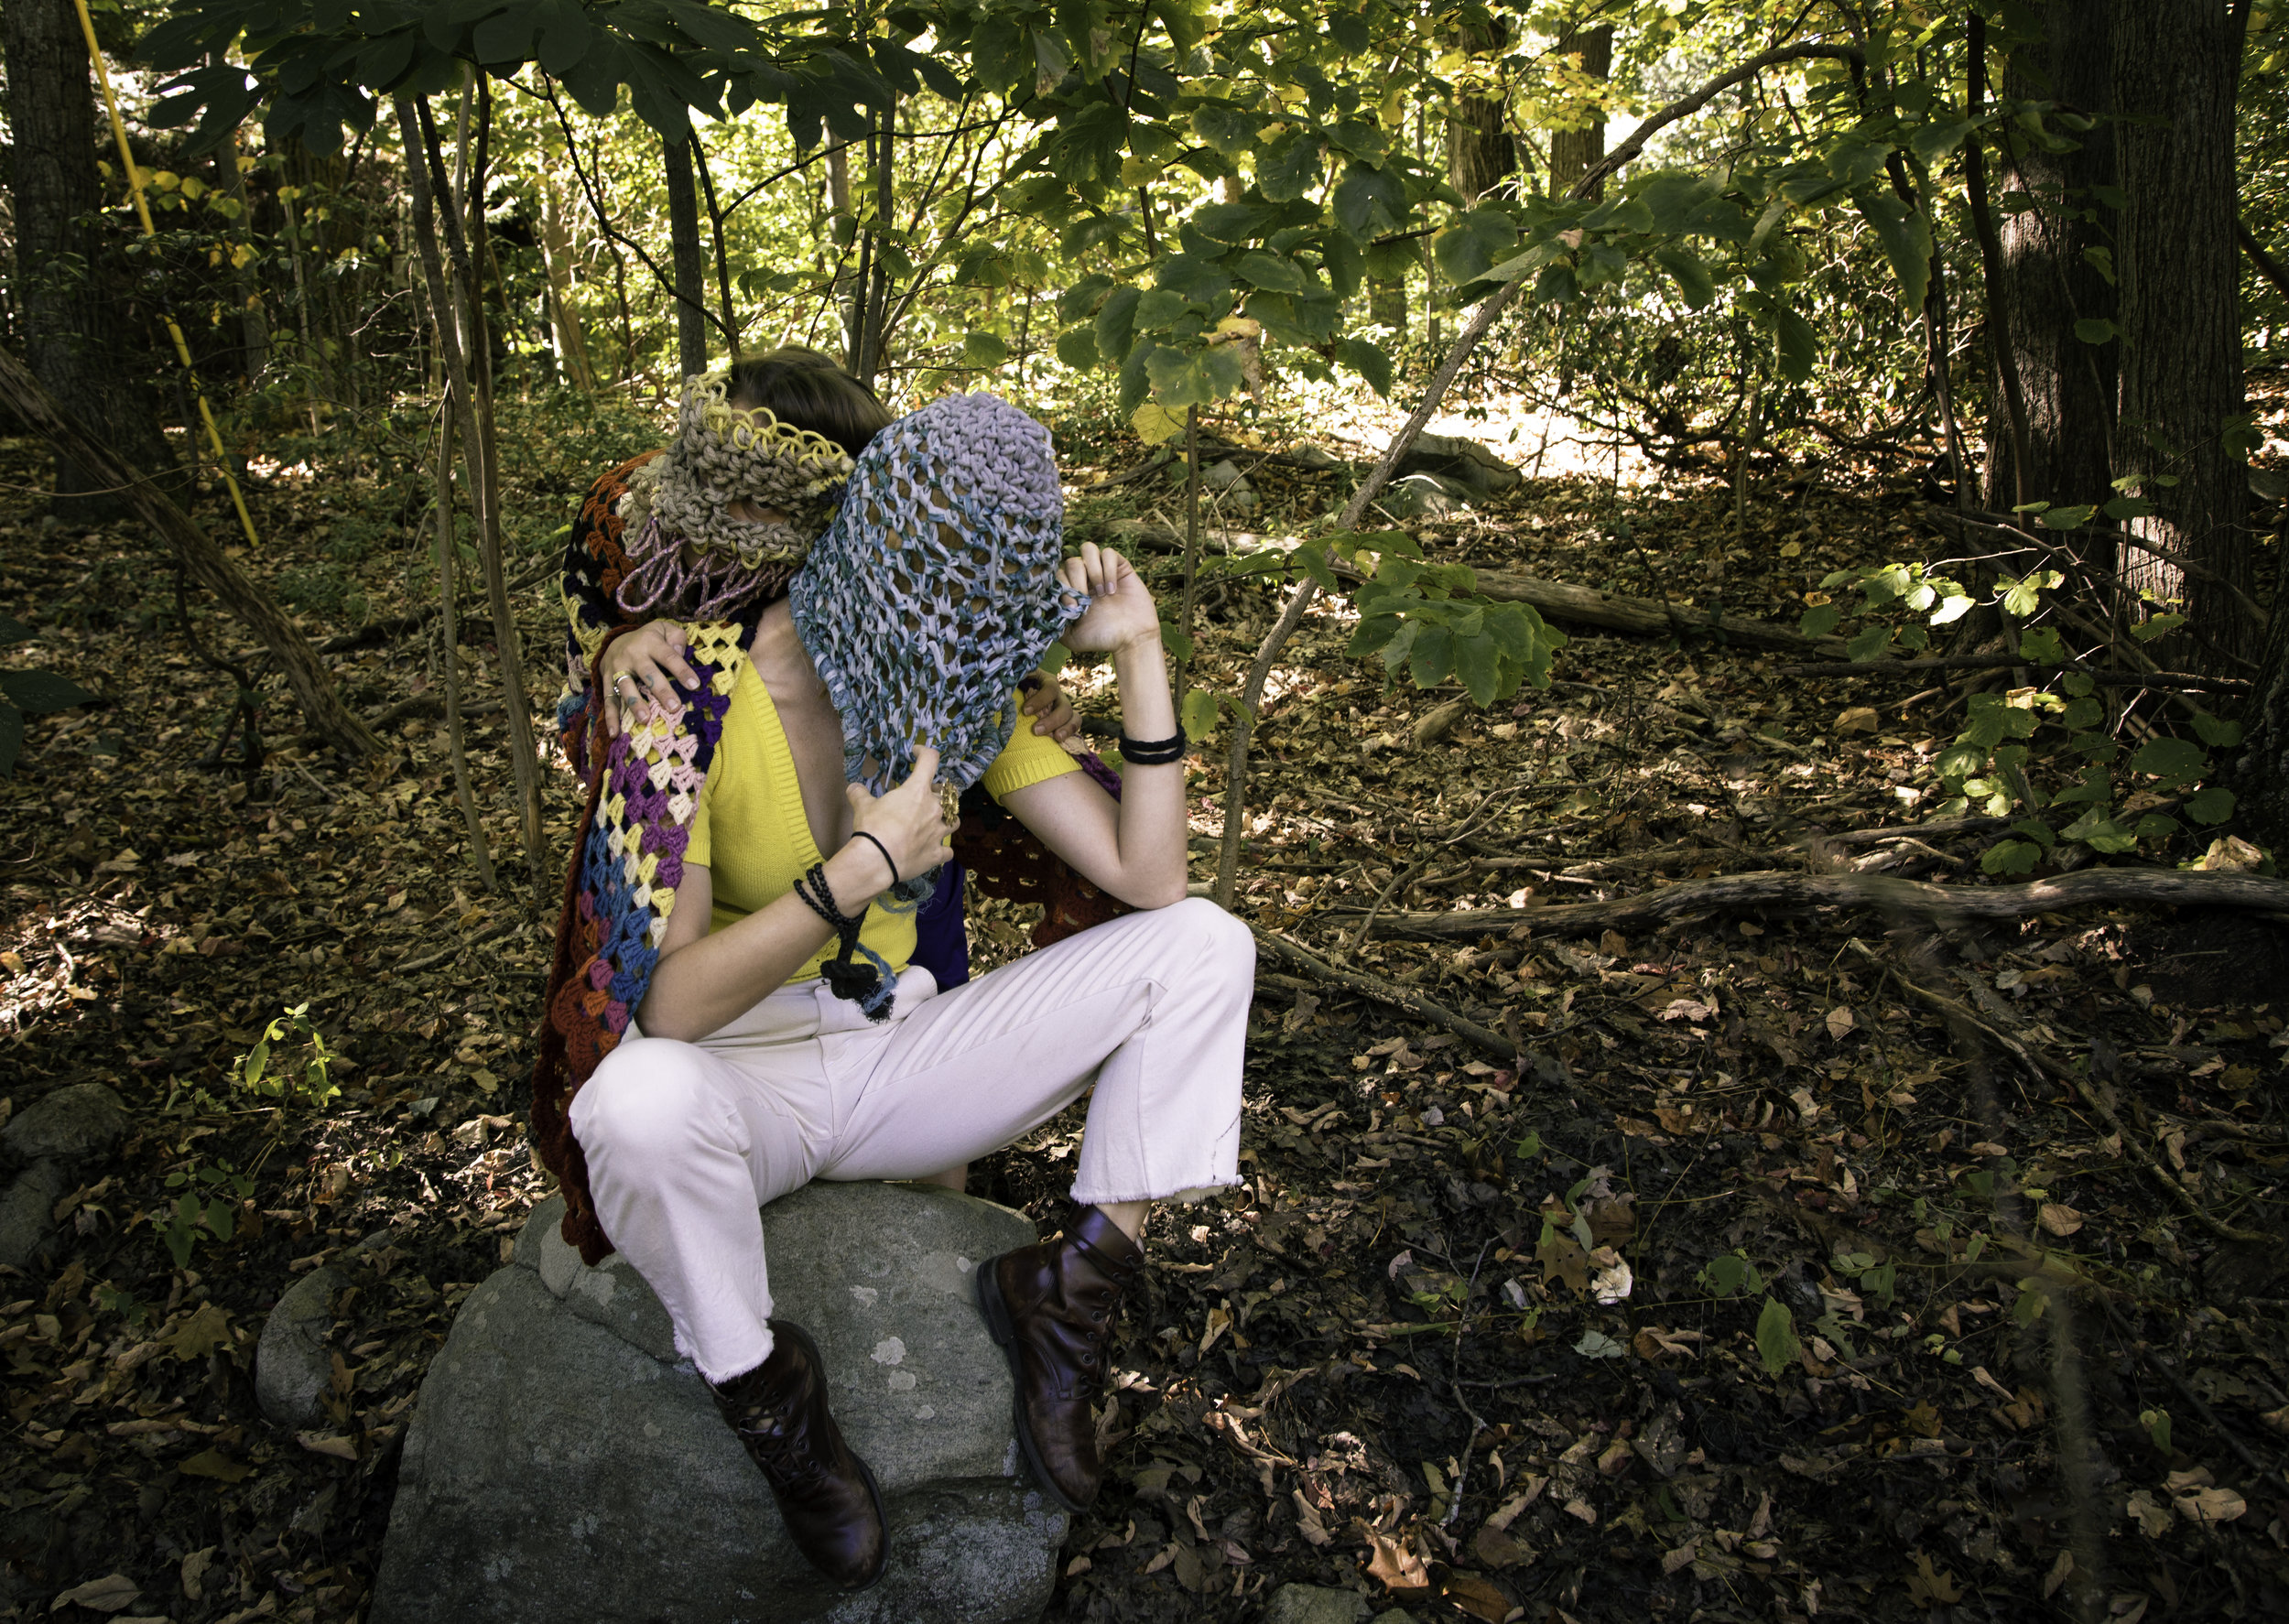 Faðma (Embrace) IV, 2017